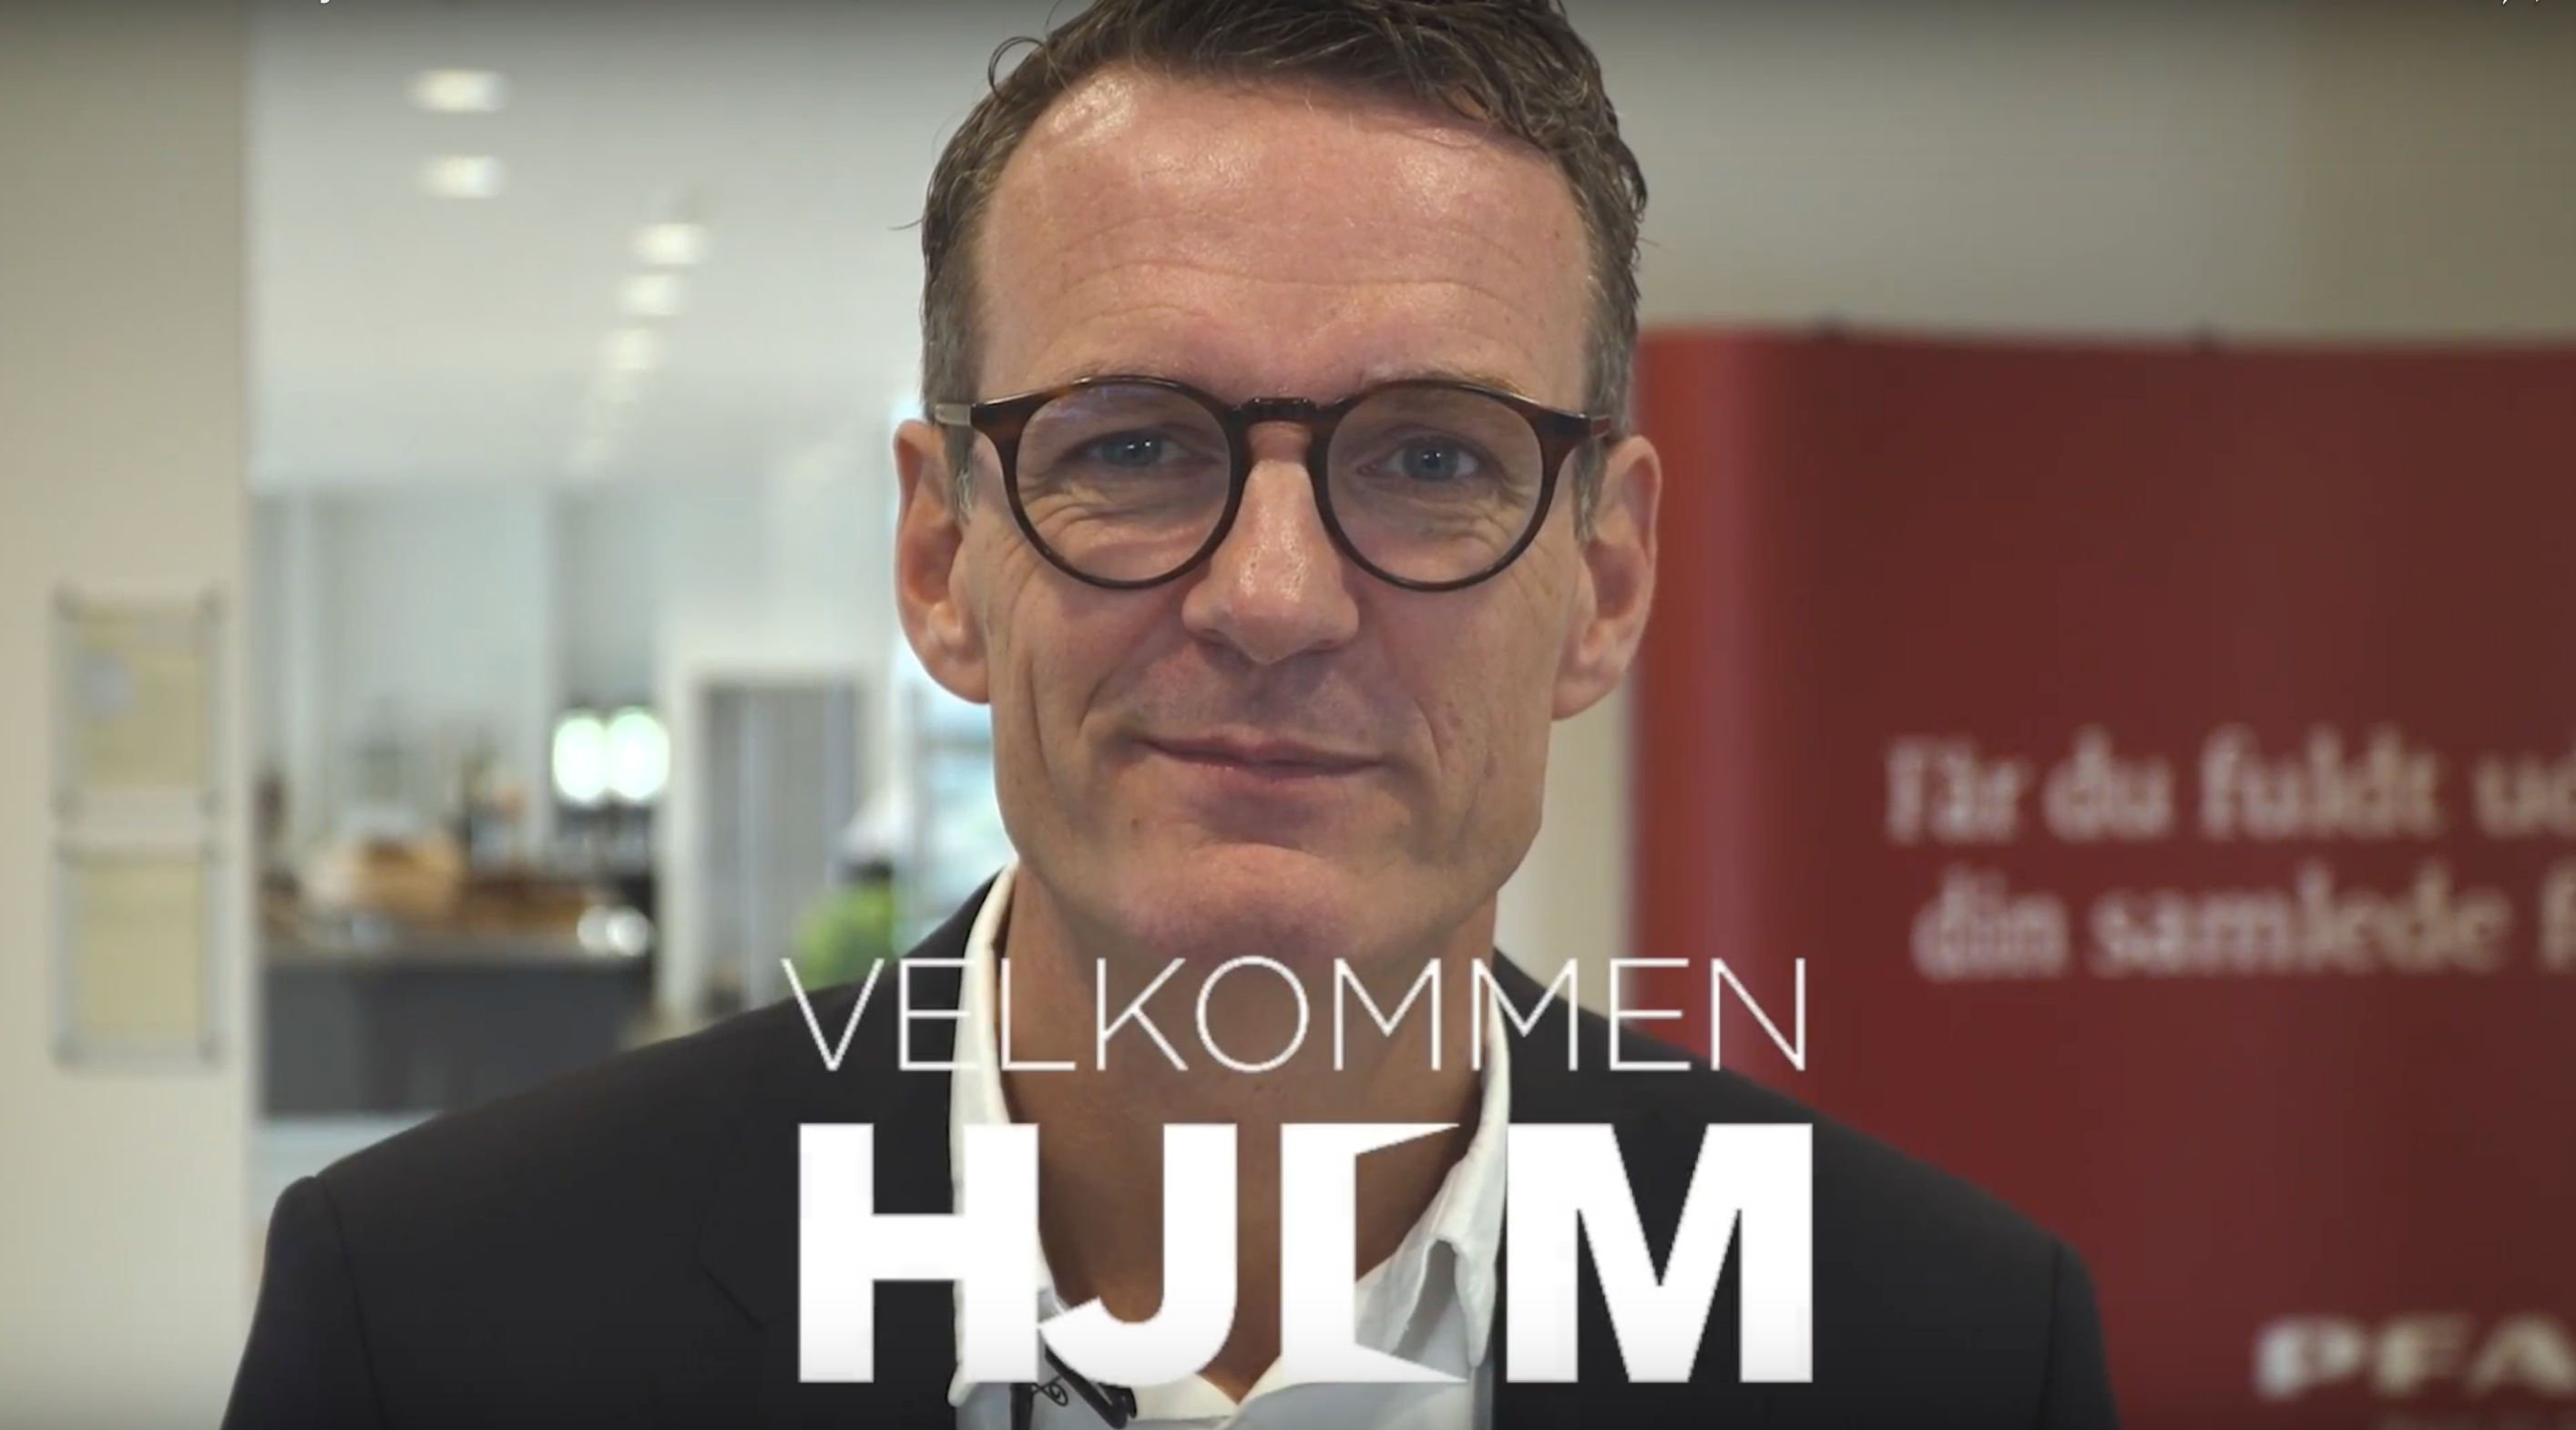 Velkommen Hjem– Jens Peter Udsholt, PFA